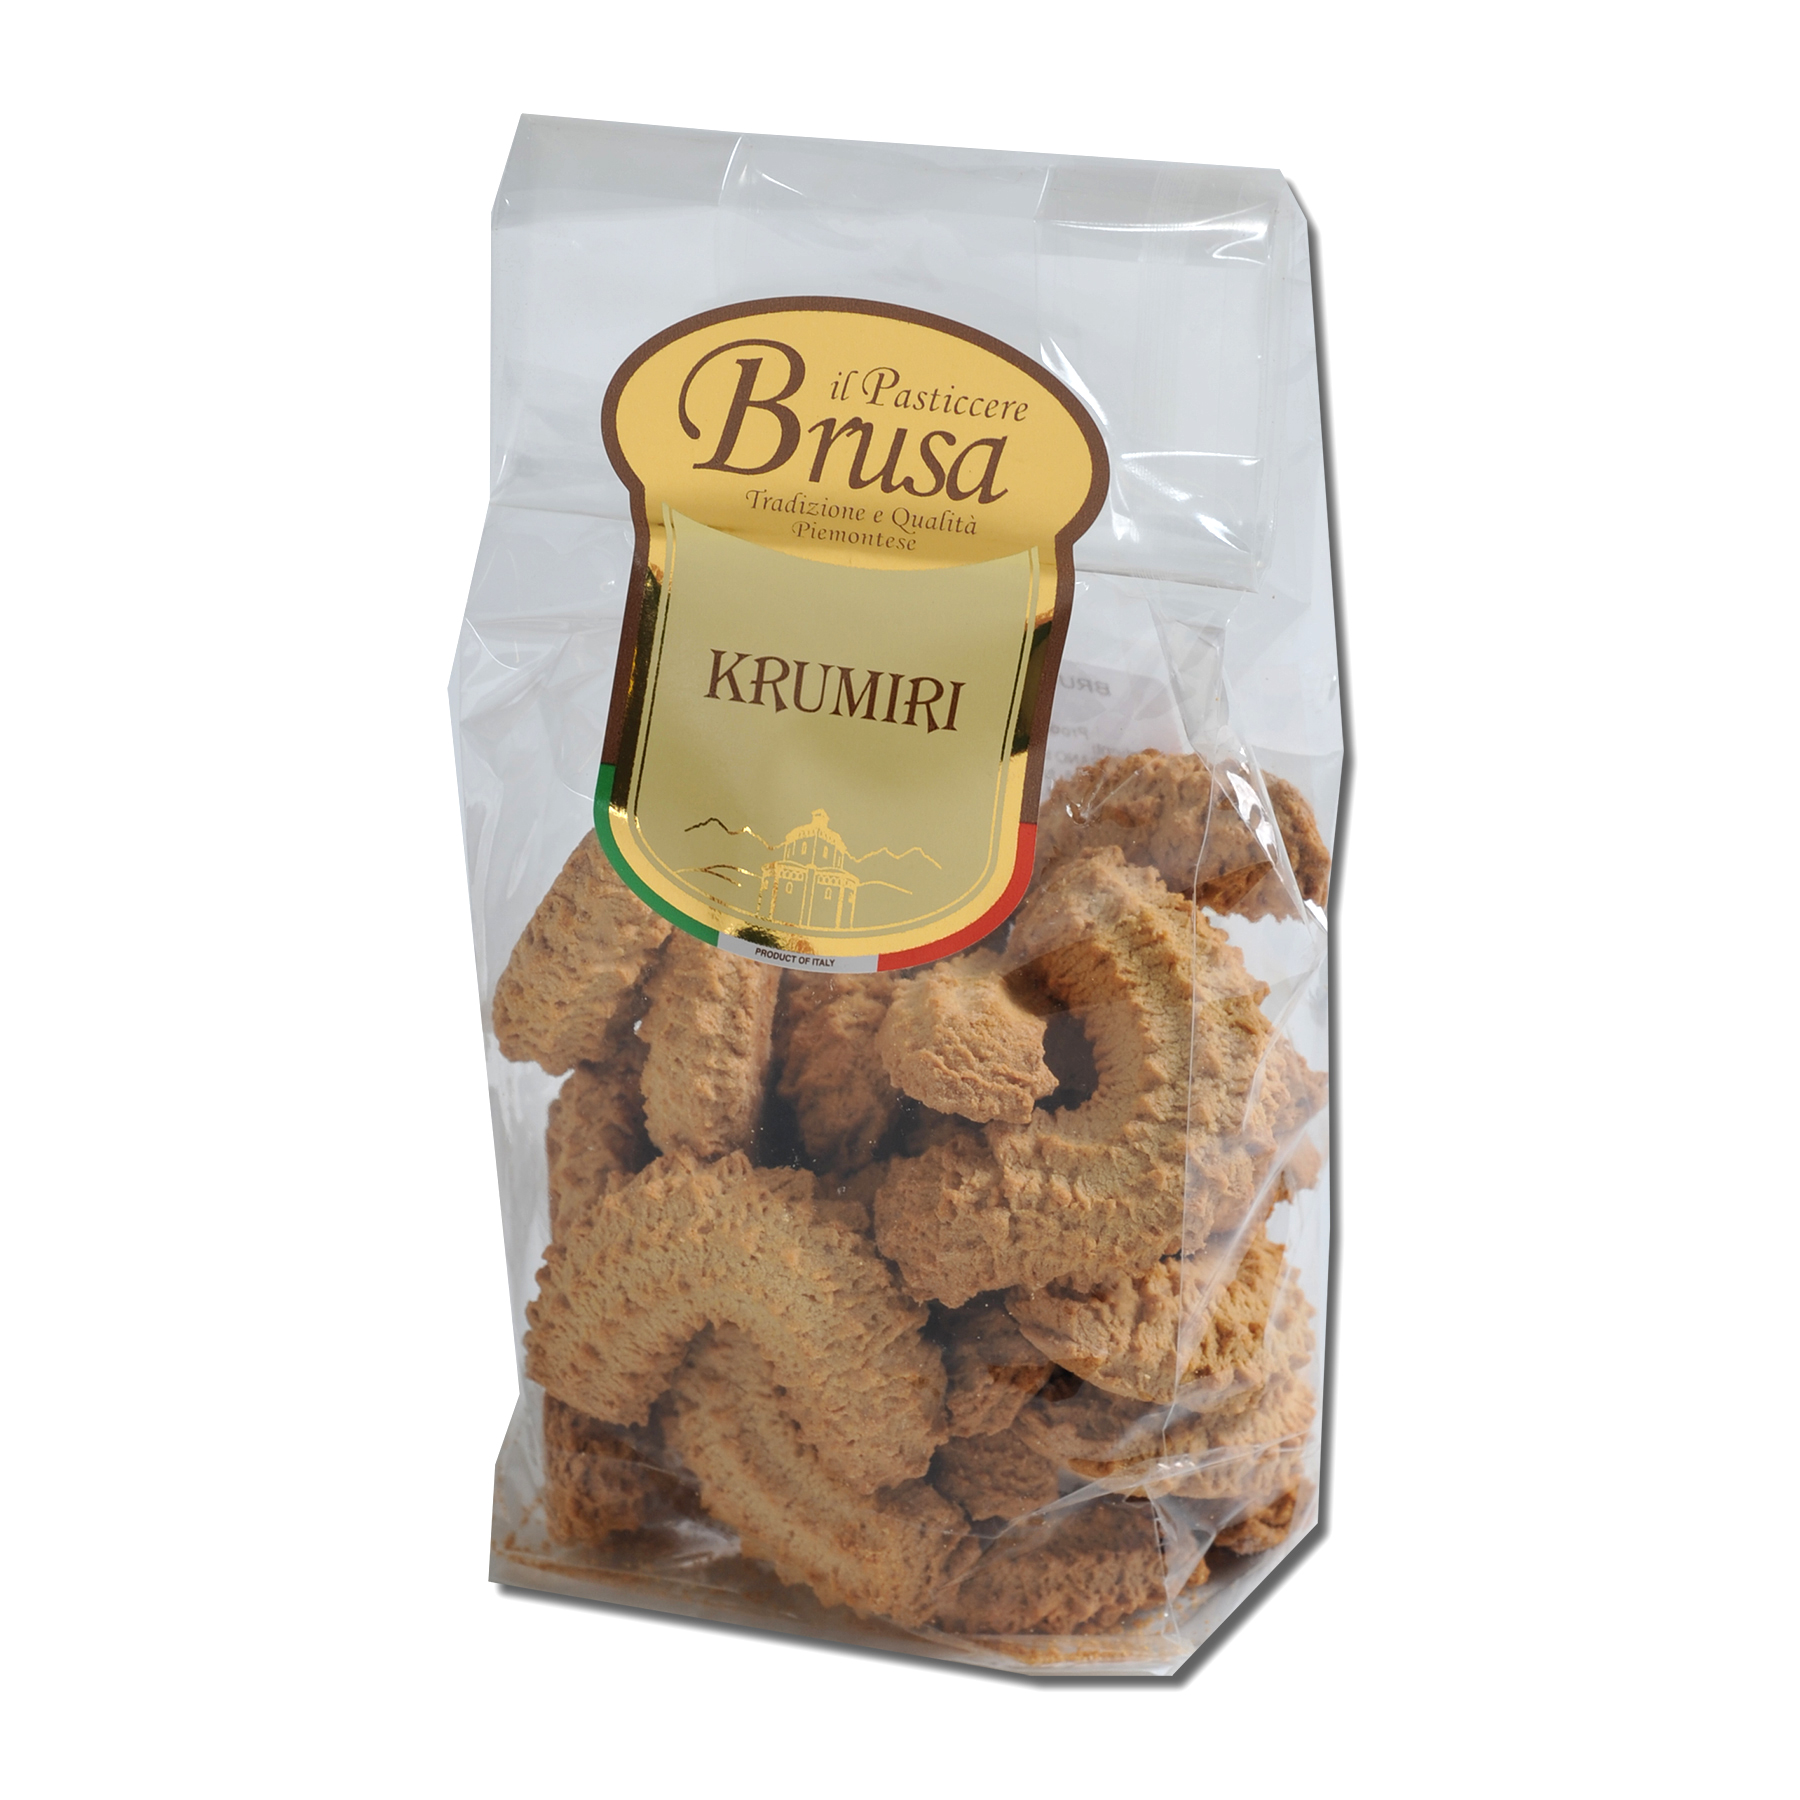 krumiri饼干-250g